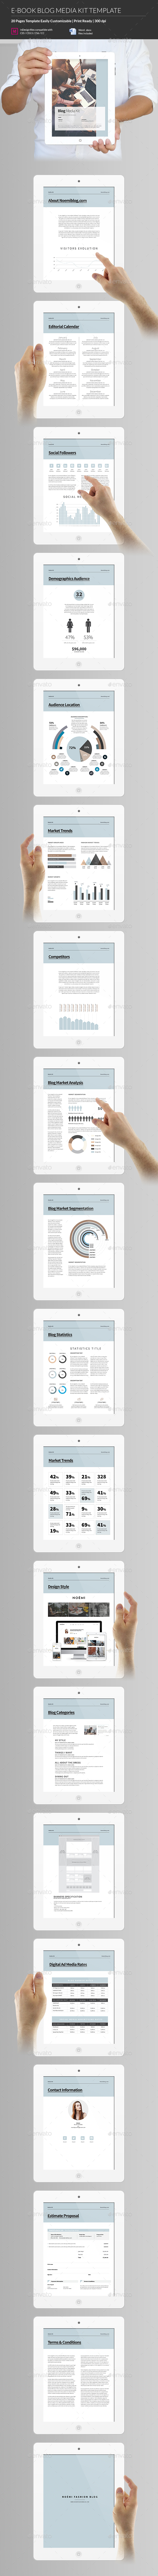 Blog Media Kit - Digital Books ePublishing